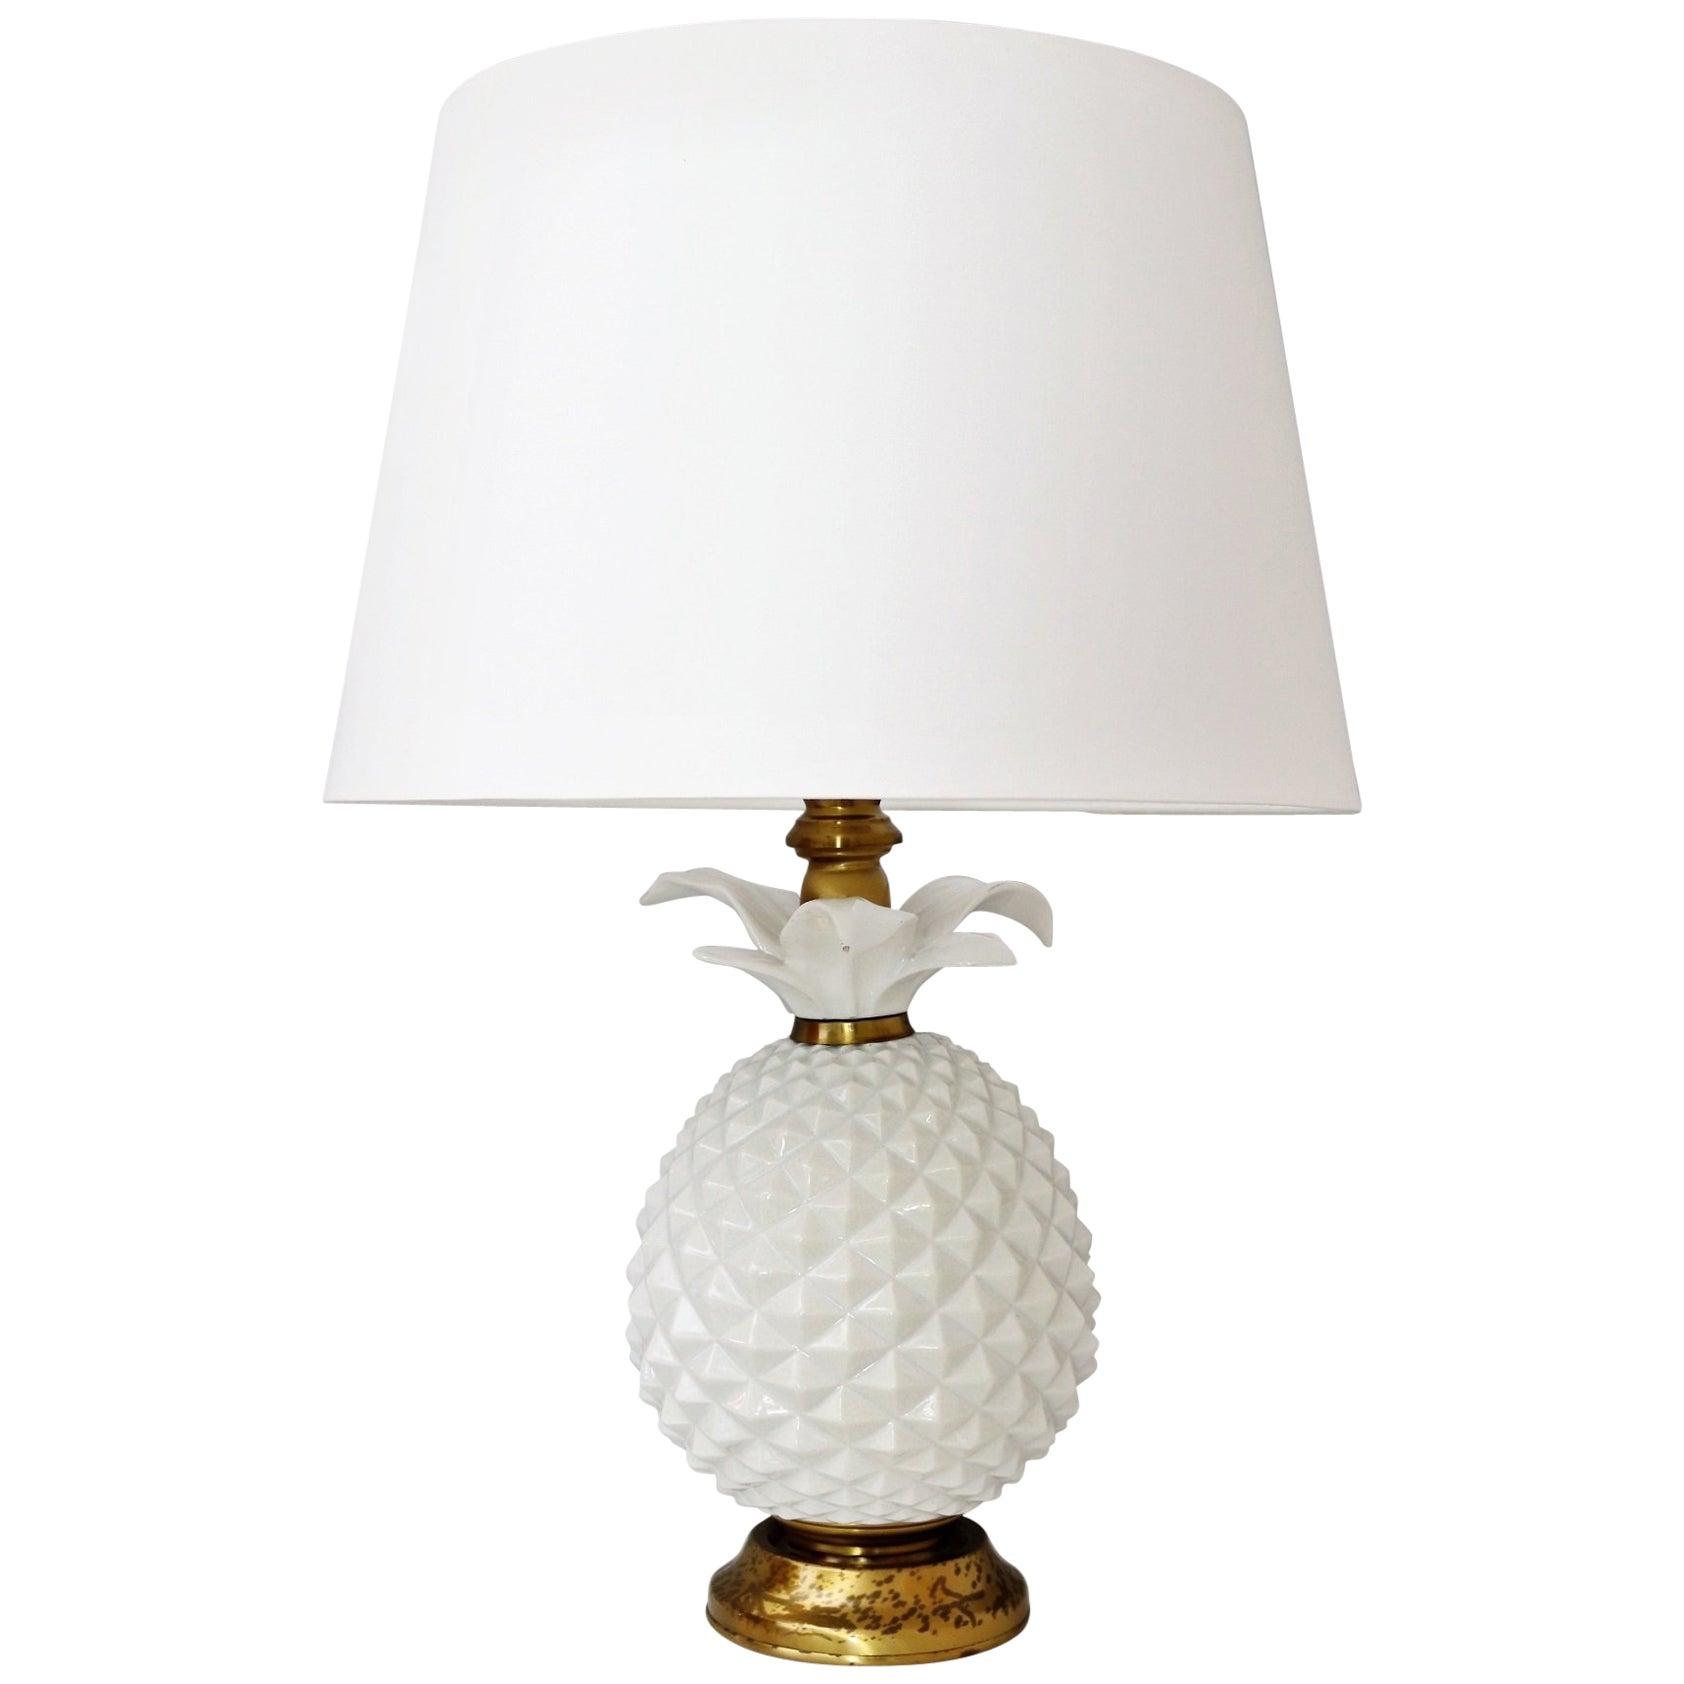 Italian Brass and Ceramic Pineapple Table Lamp, 1970s